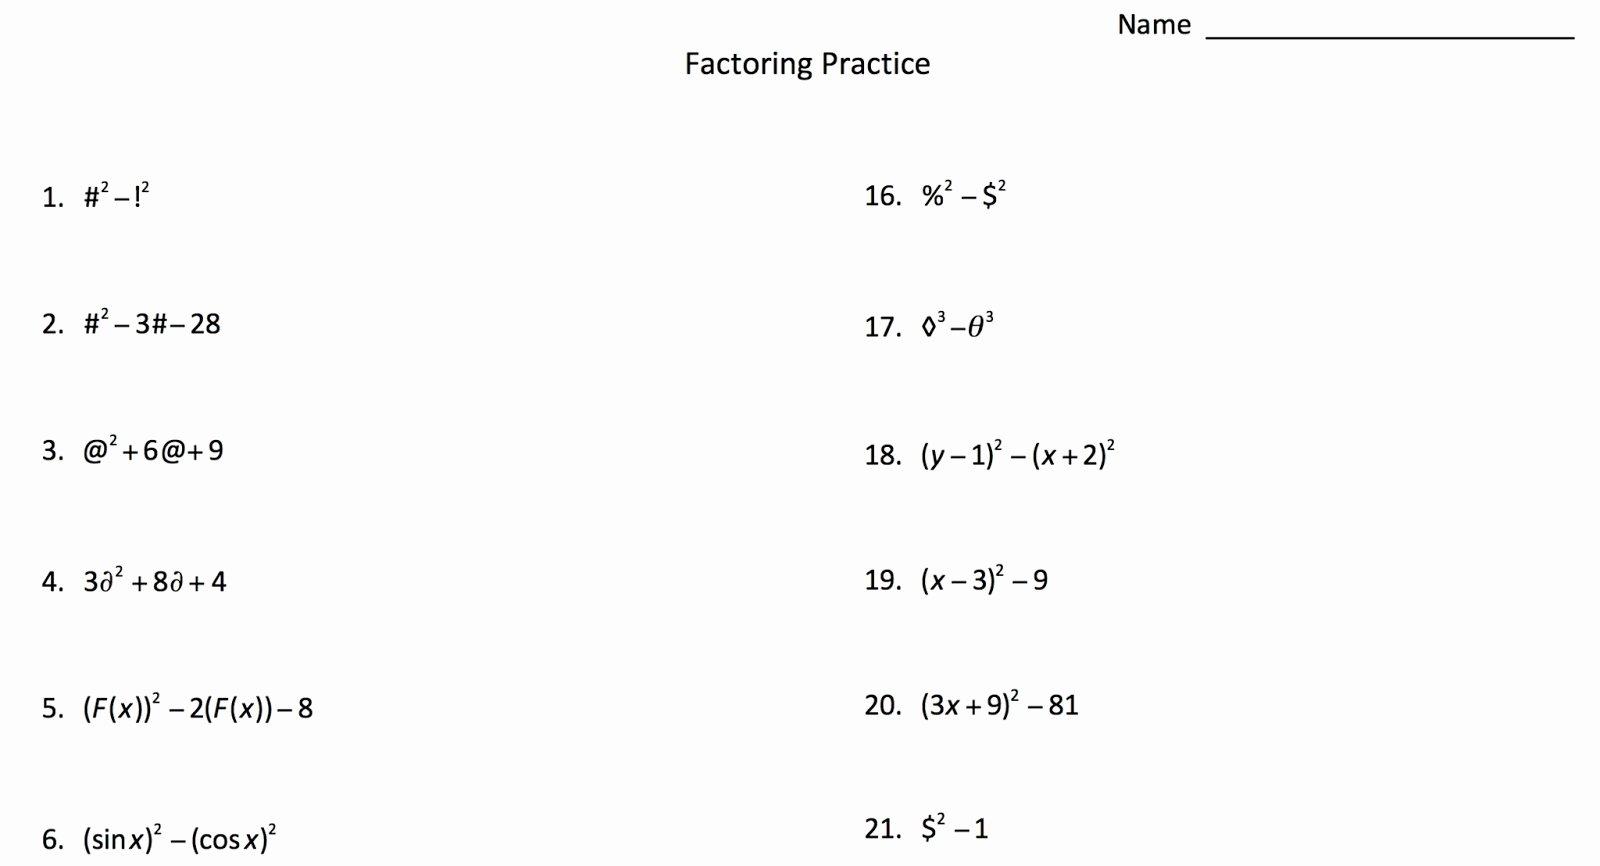 Factoring Worksheet Algebra 1 Luxury Factoring with Symbols